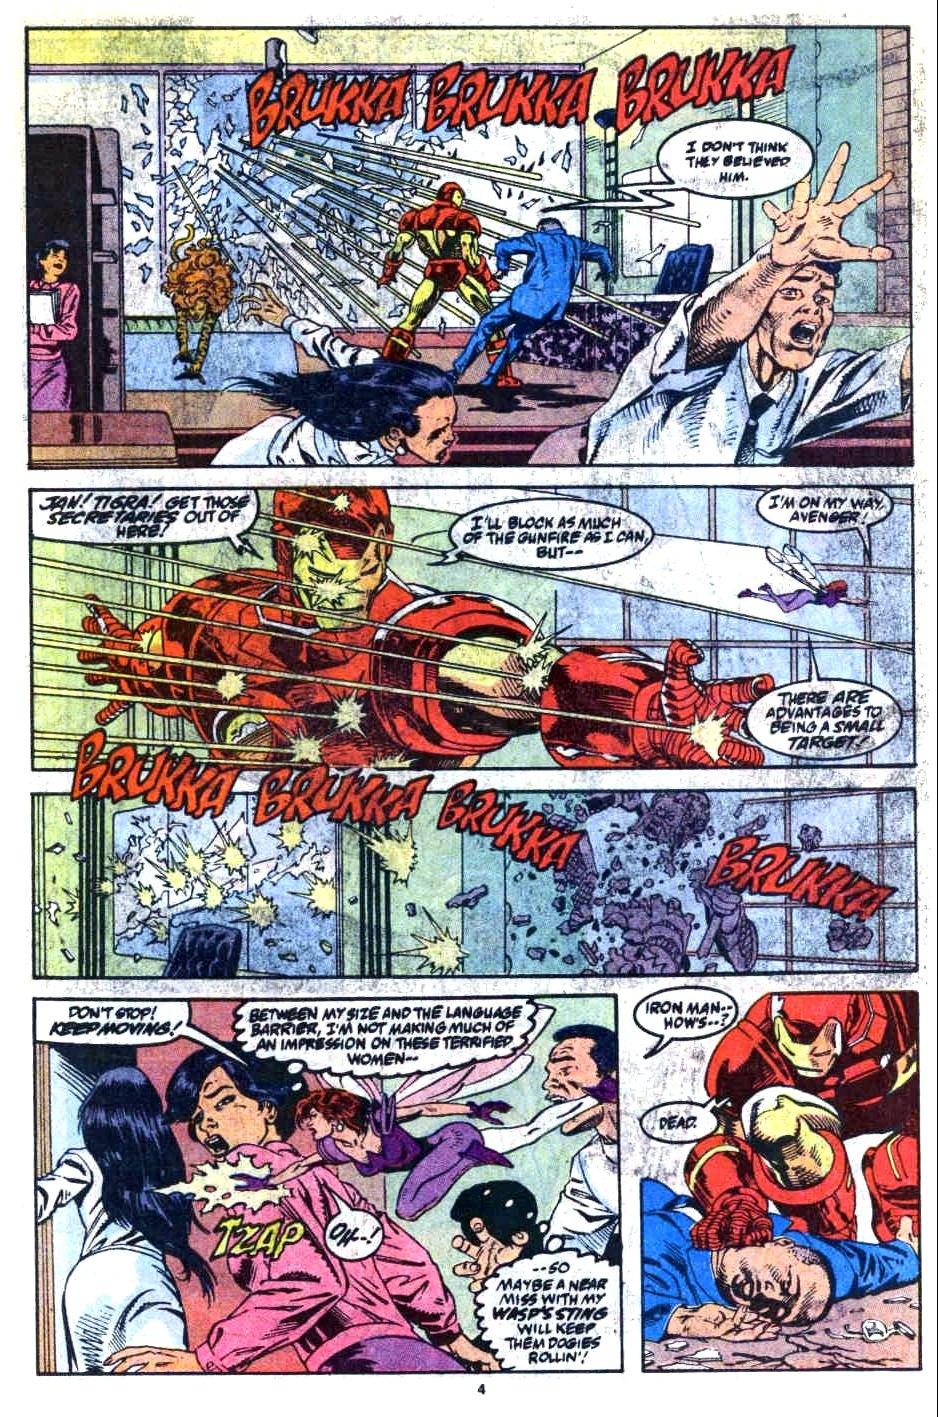 Avengers West Coast 1989 Issue 72 | Viewcomic reading comics online